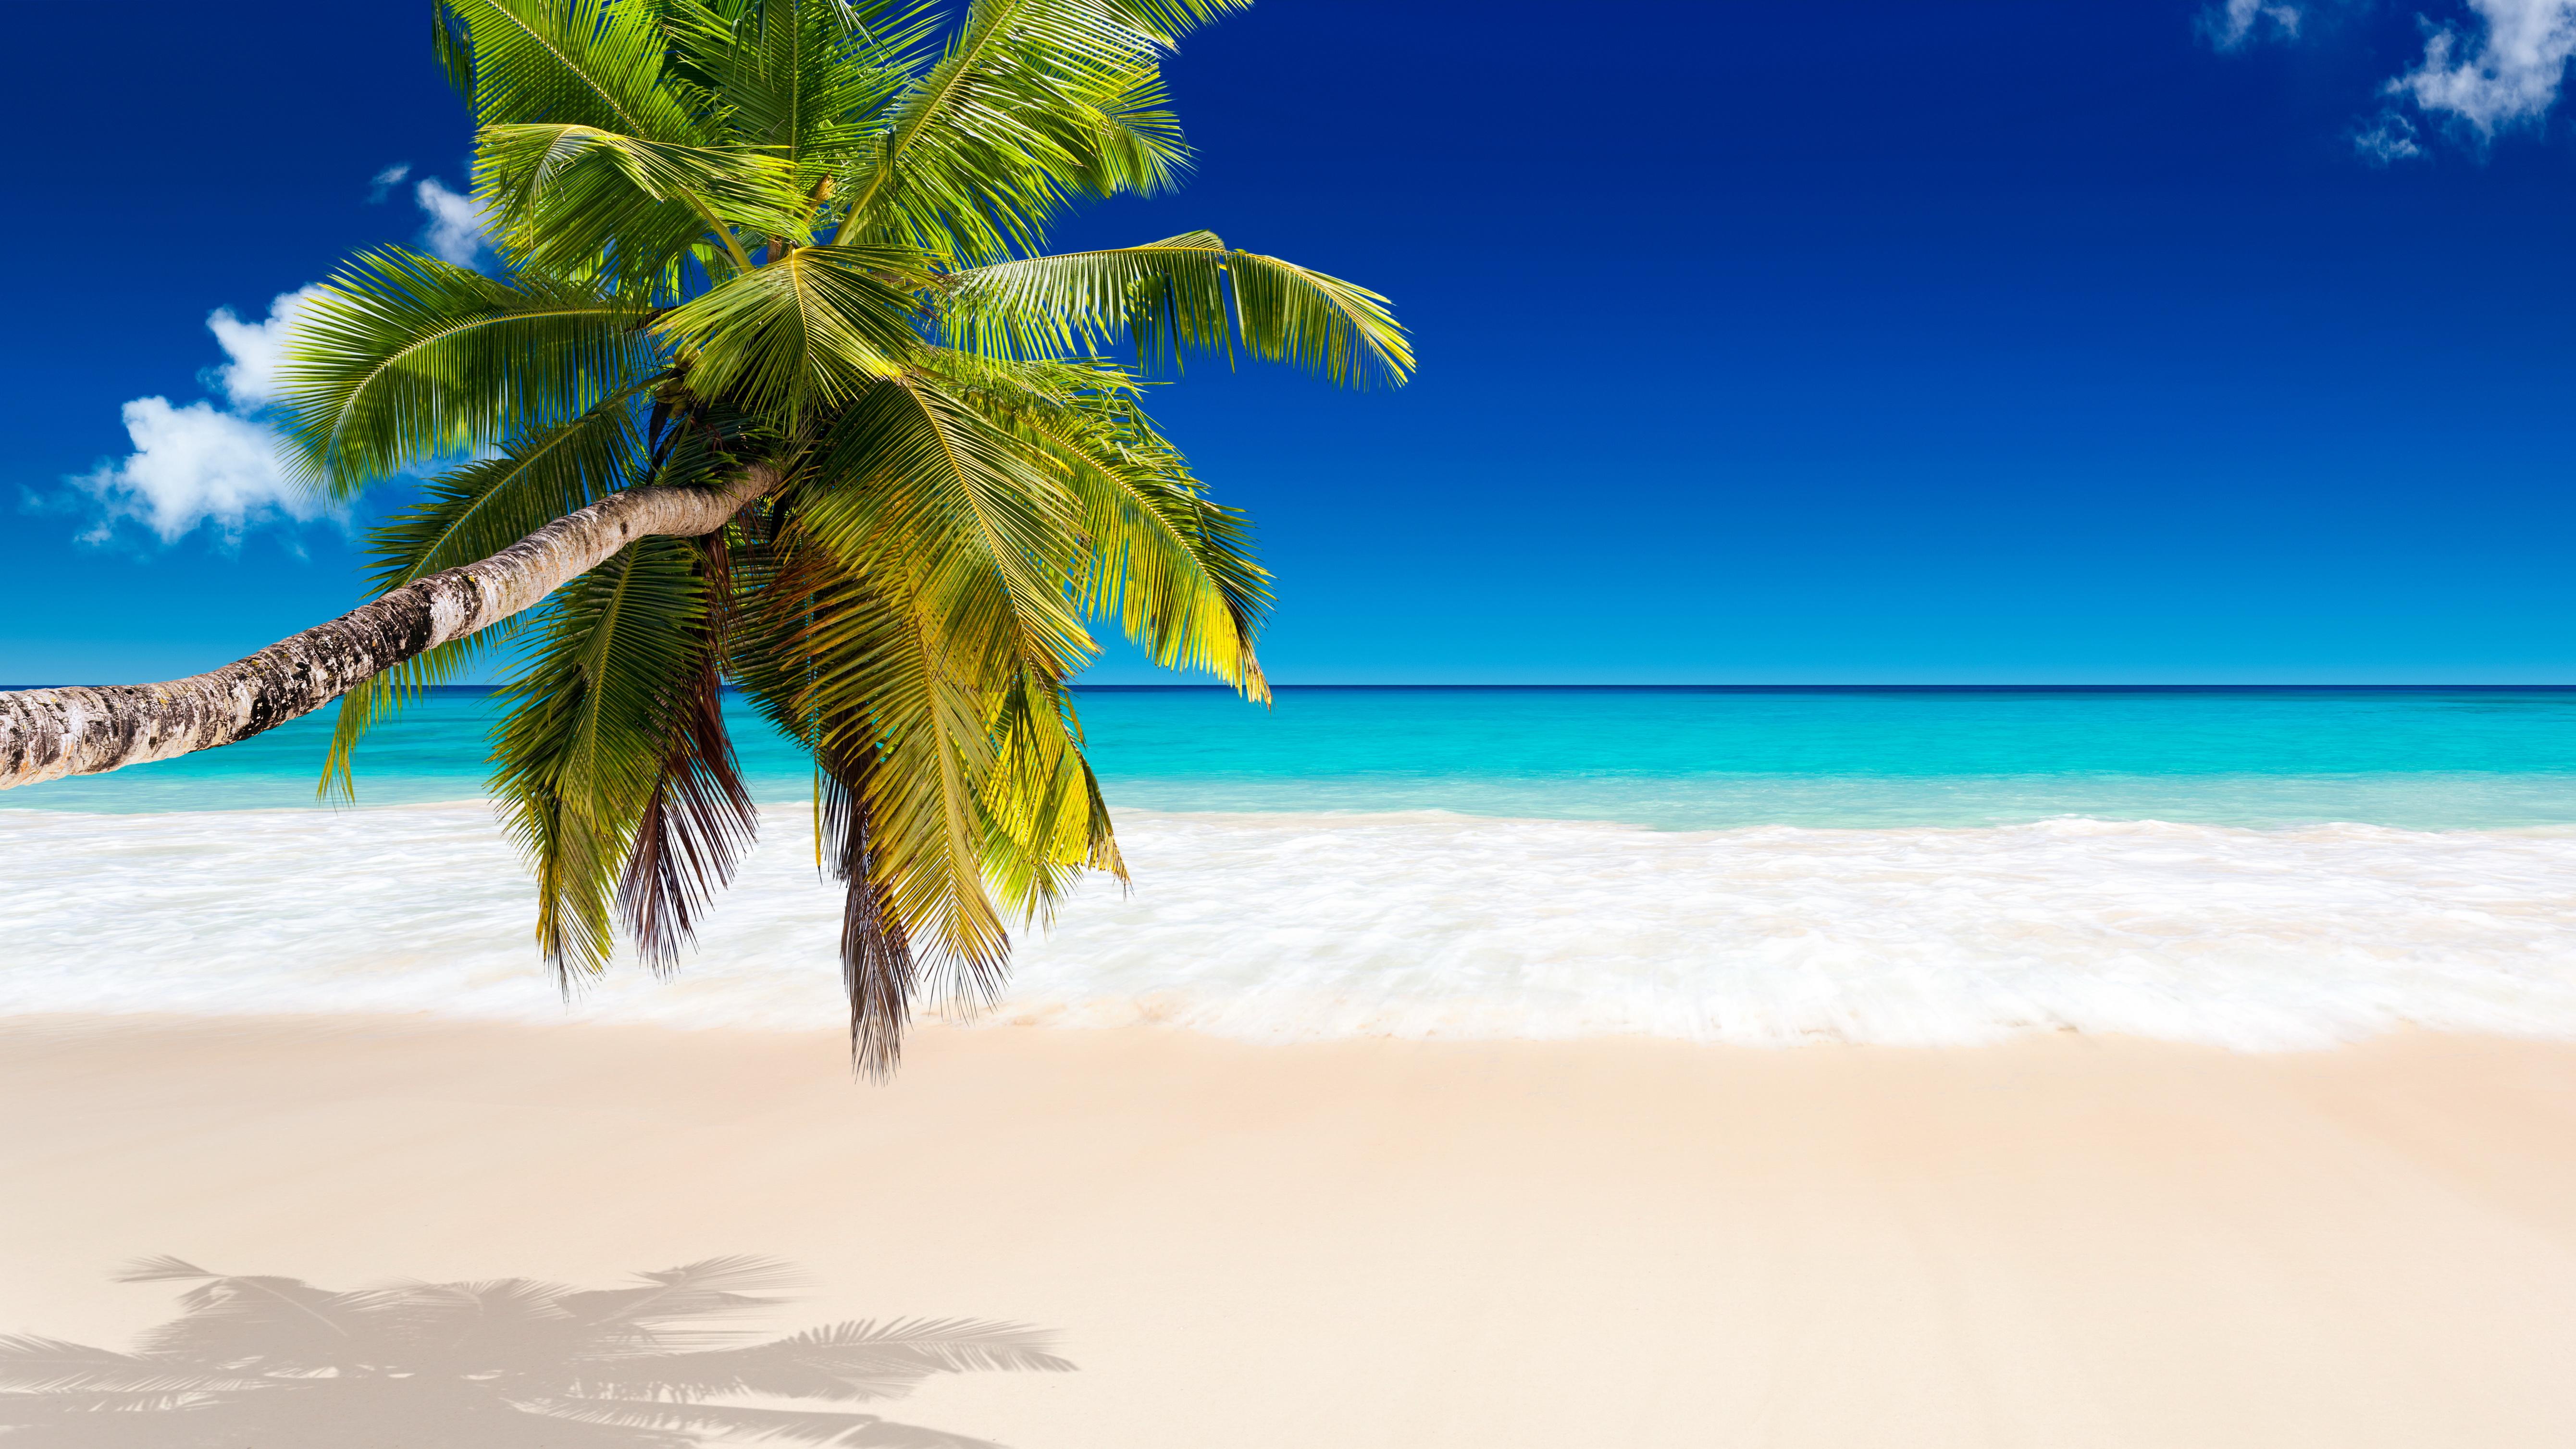 Tropical Beach Wallpaper Tropical Beach Beach Desktop 158923